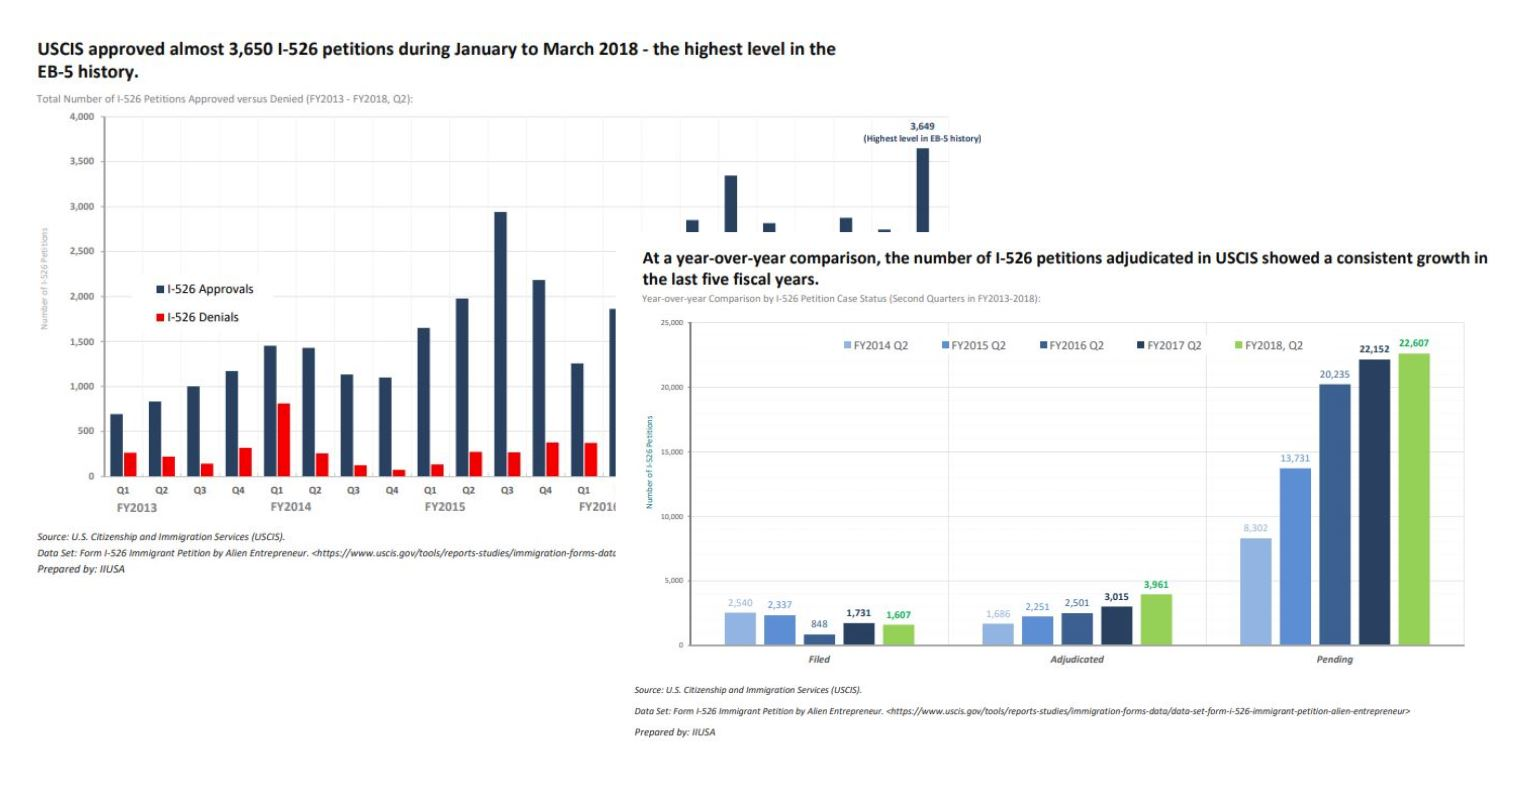 IIUSA Data Report: USCIS Q2 Processing Statistics for I-526 Petitions